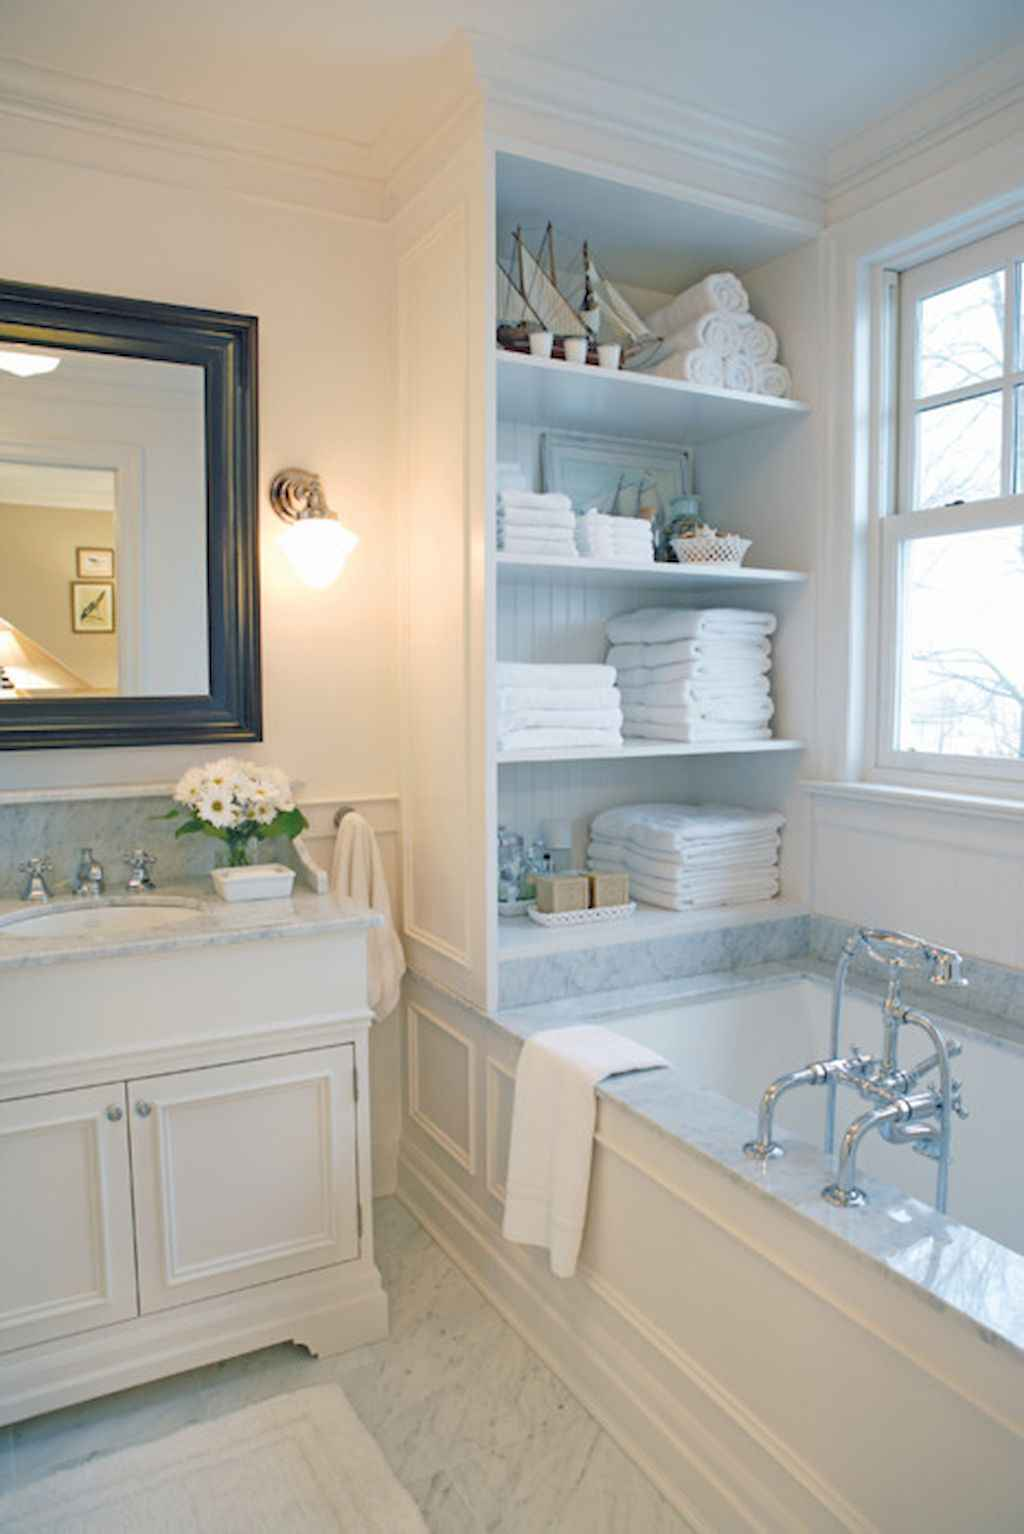 Cool bathroom storage shelves organization ideas (70)